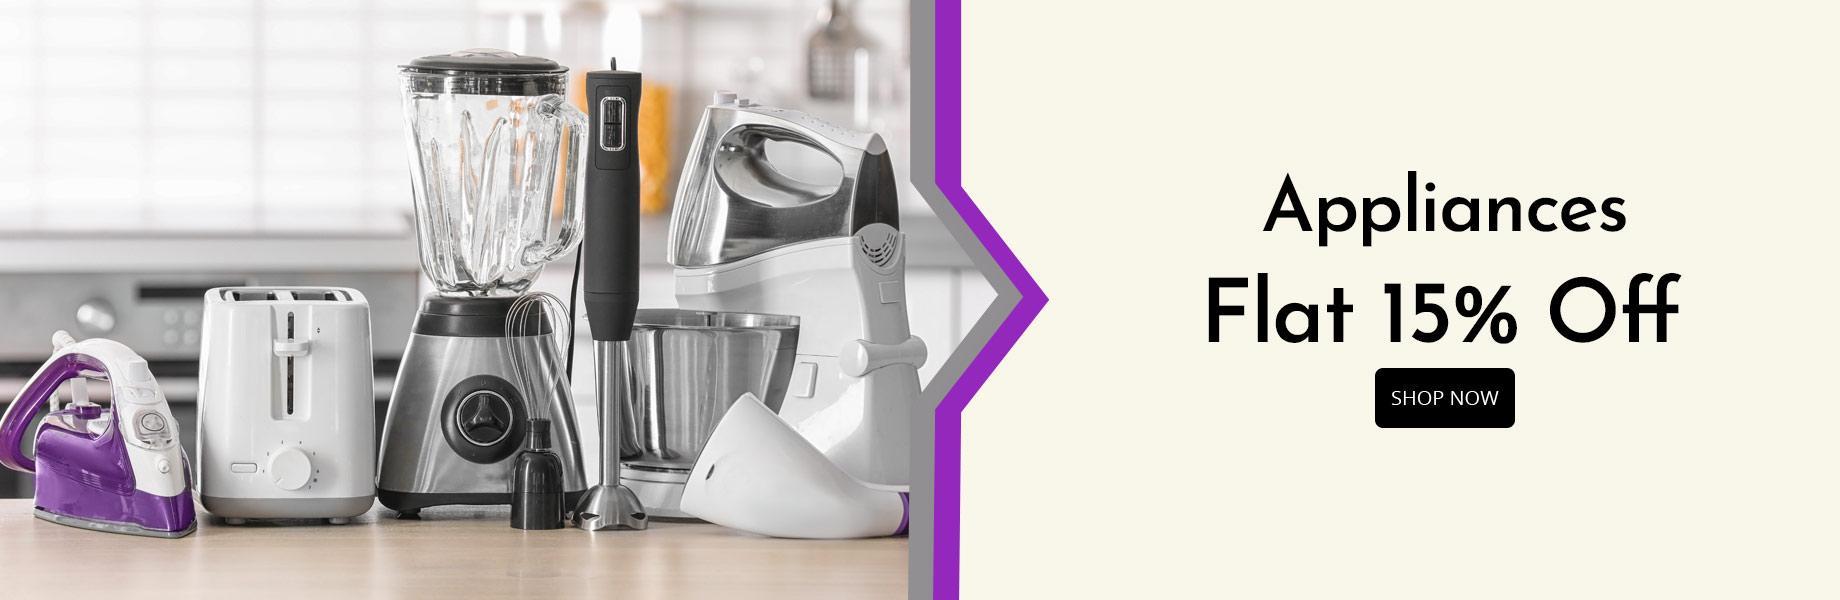 Offer-Page-Home-&-Kitchen-Static-Appliances-Webv.jpg